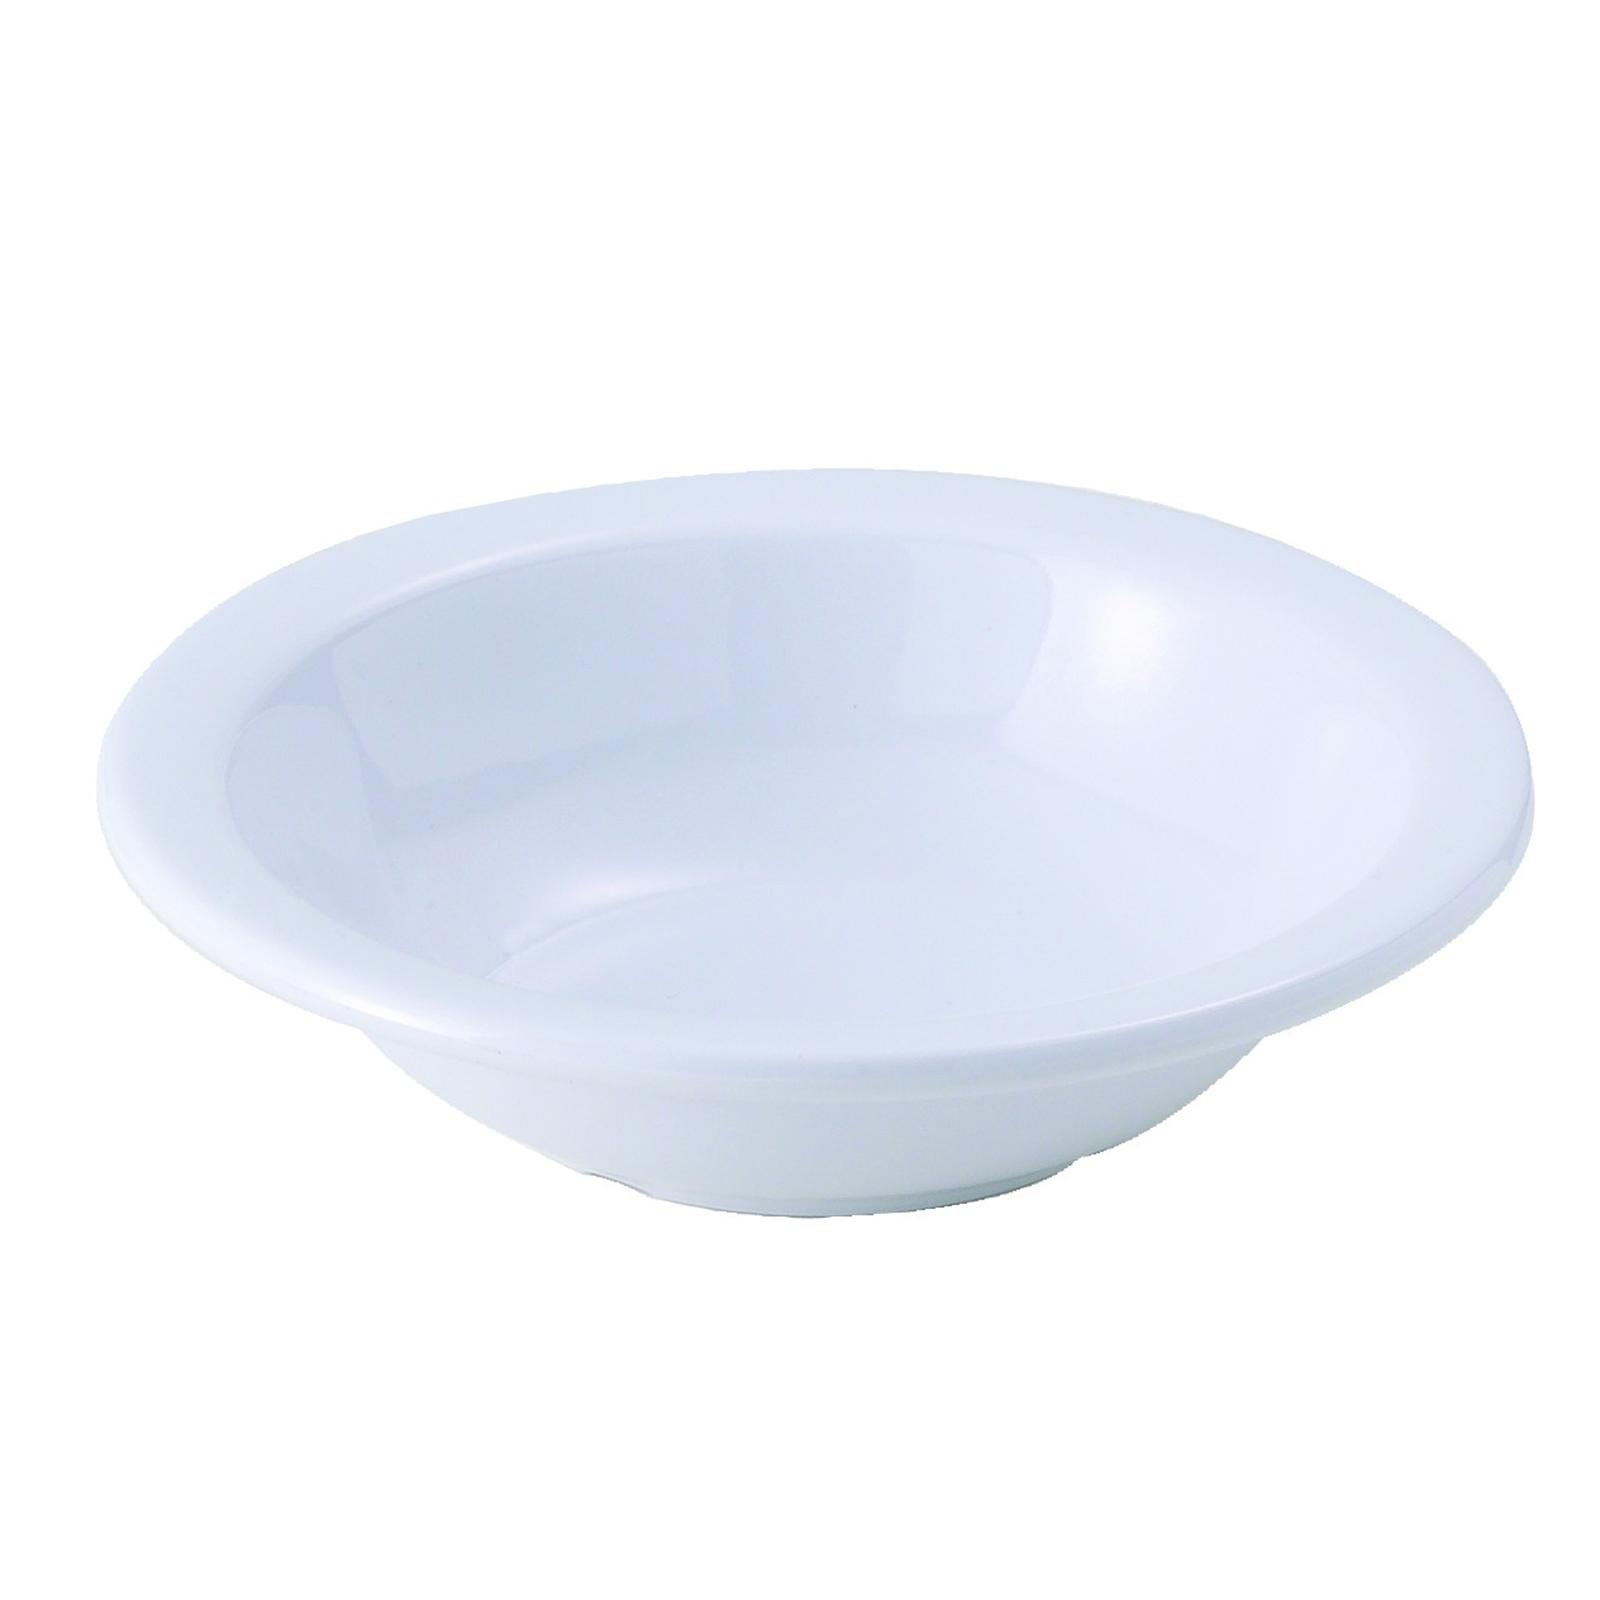 Winco MMB-13W grapefruit bowl, plastic